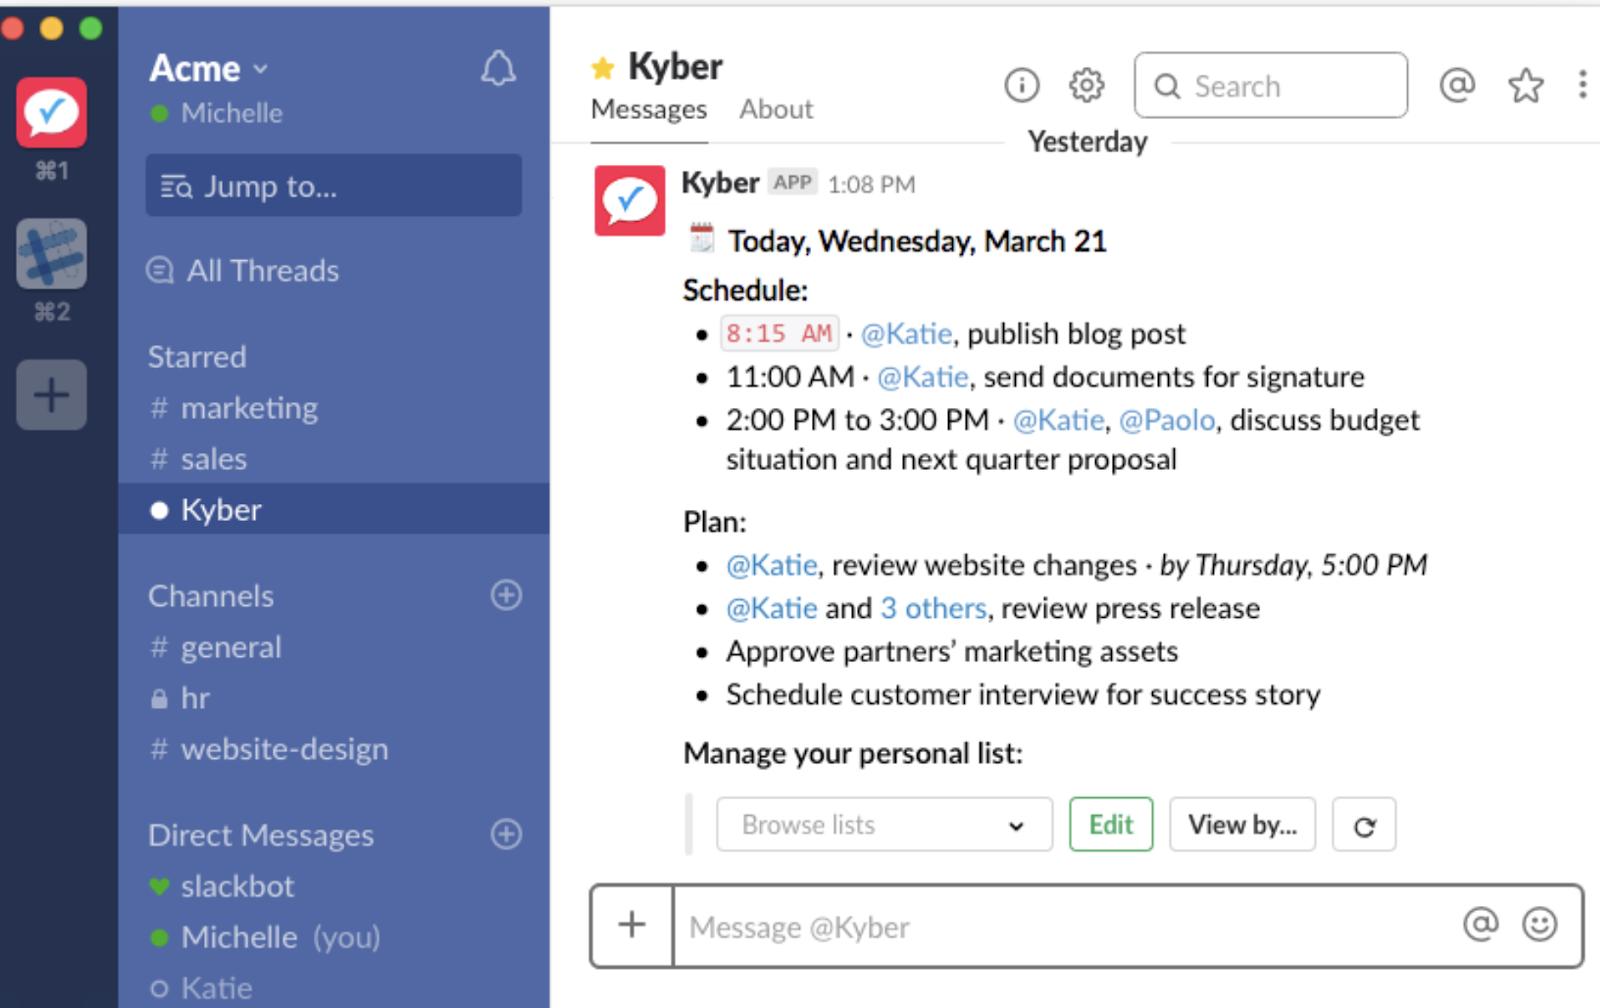 Kyber integrates with slack